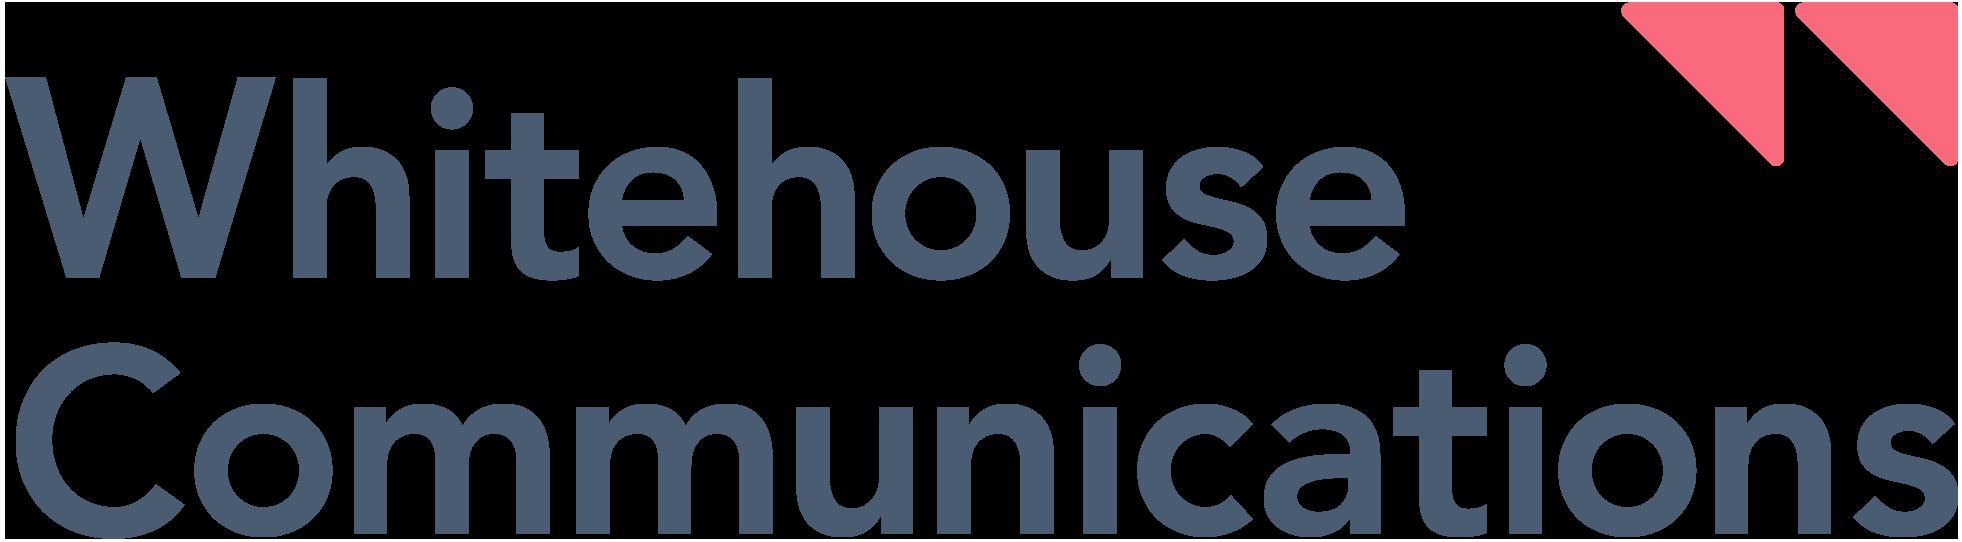 wh comms logo dark